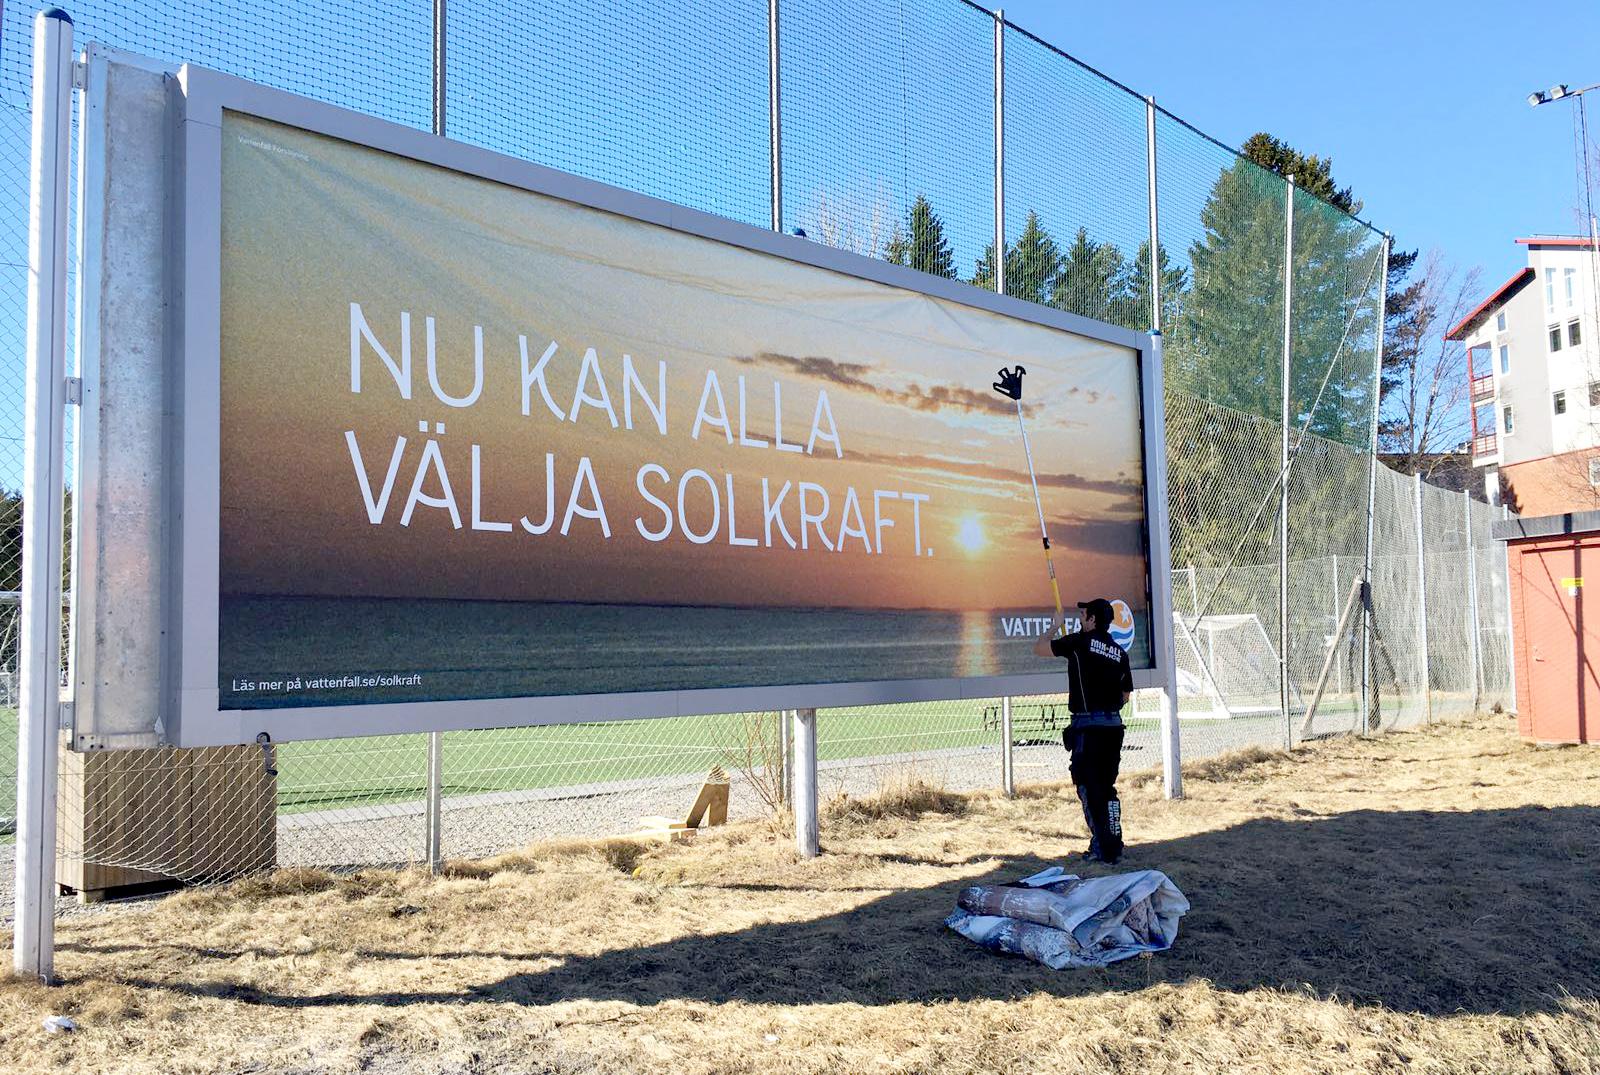 Affischering i Umeå, MIK ALL Service AB. Vattenfall